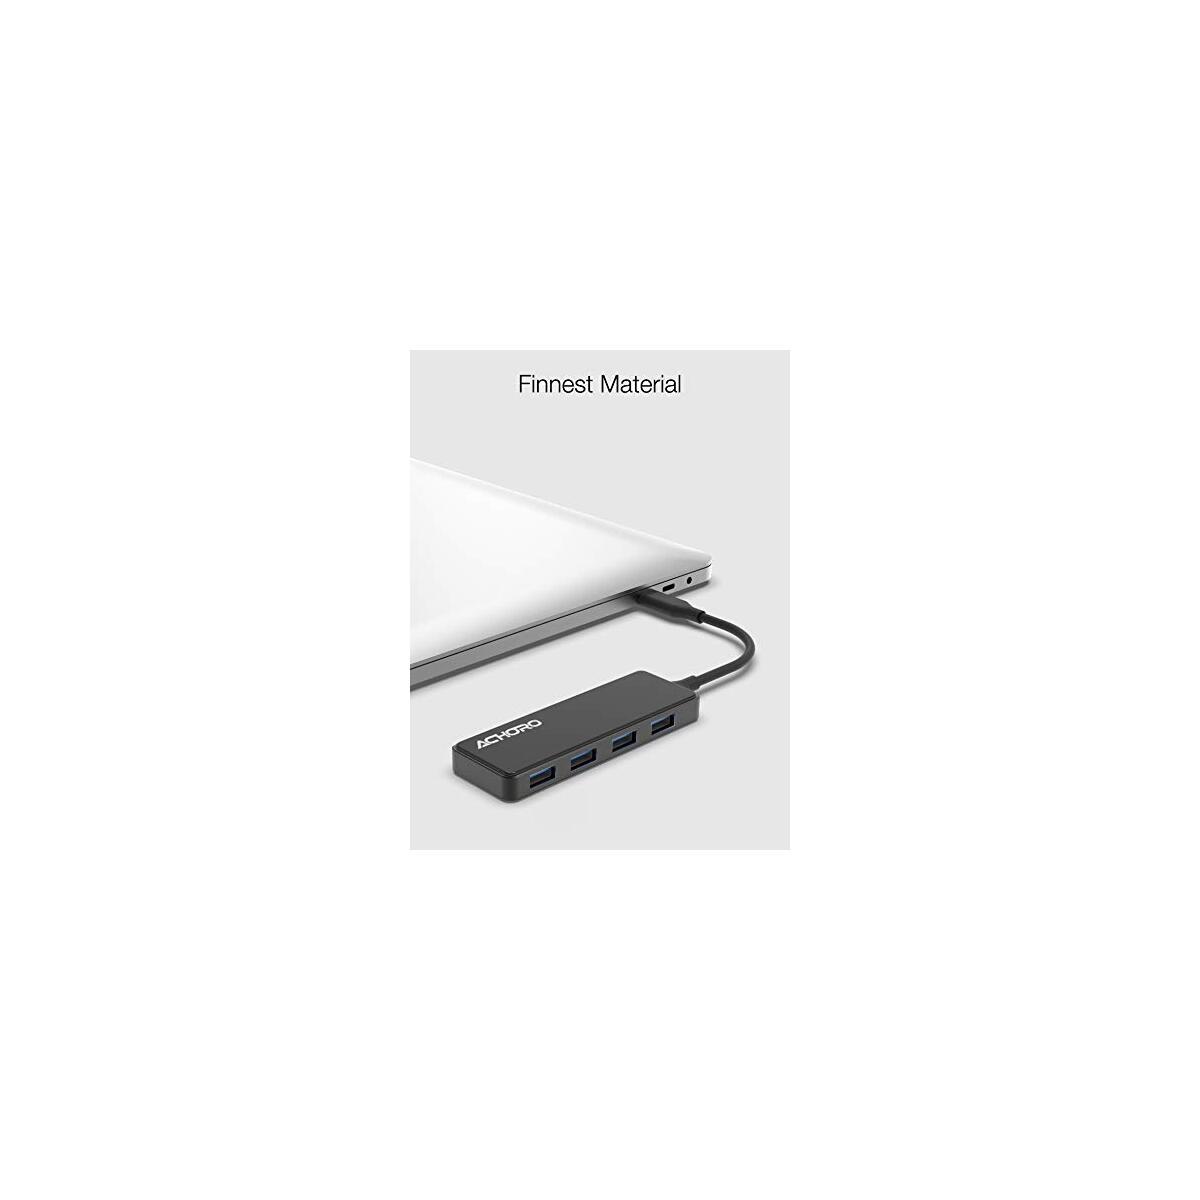 ACHORO Premium Quality 4 USB Ports Data Transfer Hub - Tempered Glass & Polished Zinc Alloy Material - USB 3.0 High-Speed Data Transfer Slim USB Hub